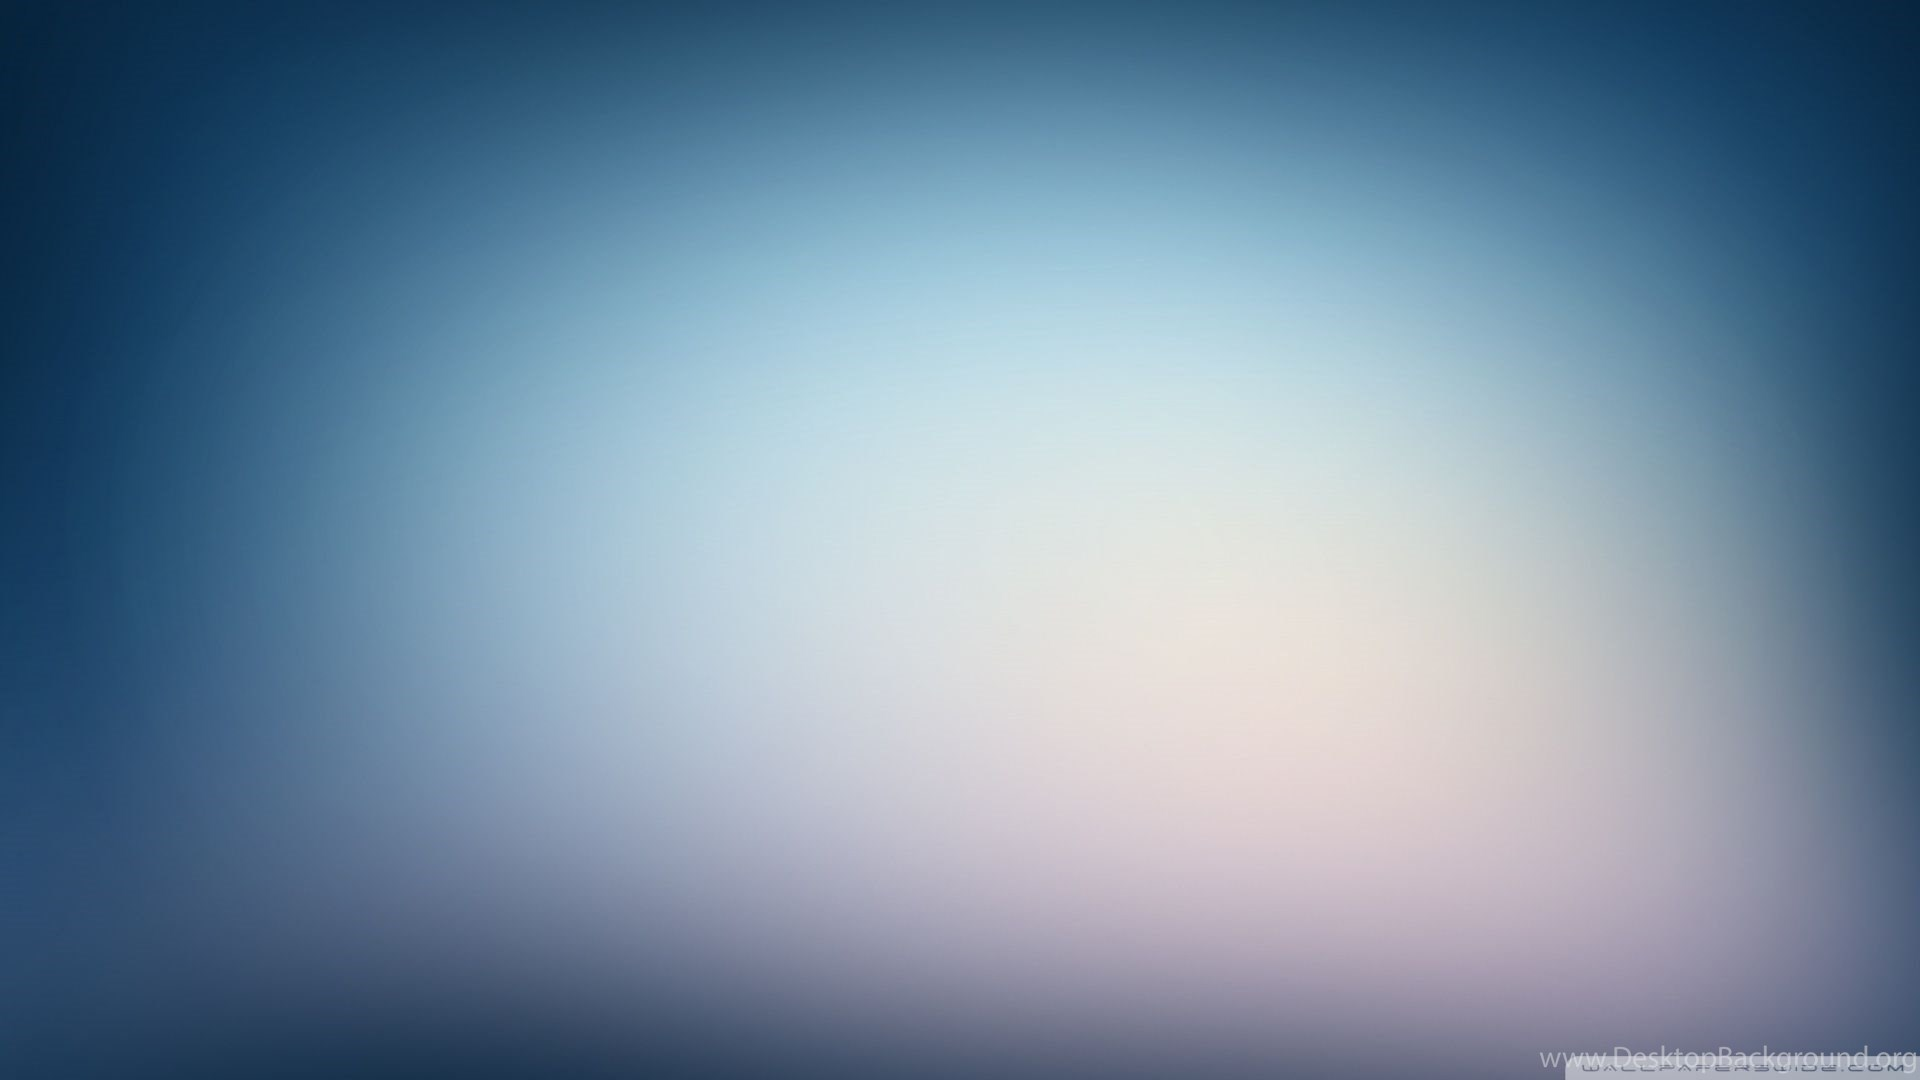 Top Gaussian Blur Phone Wallpaper Images For Pinterest